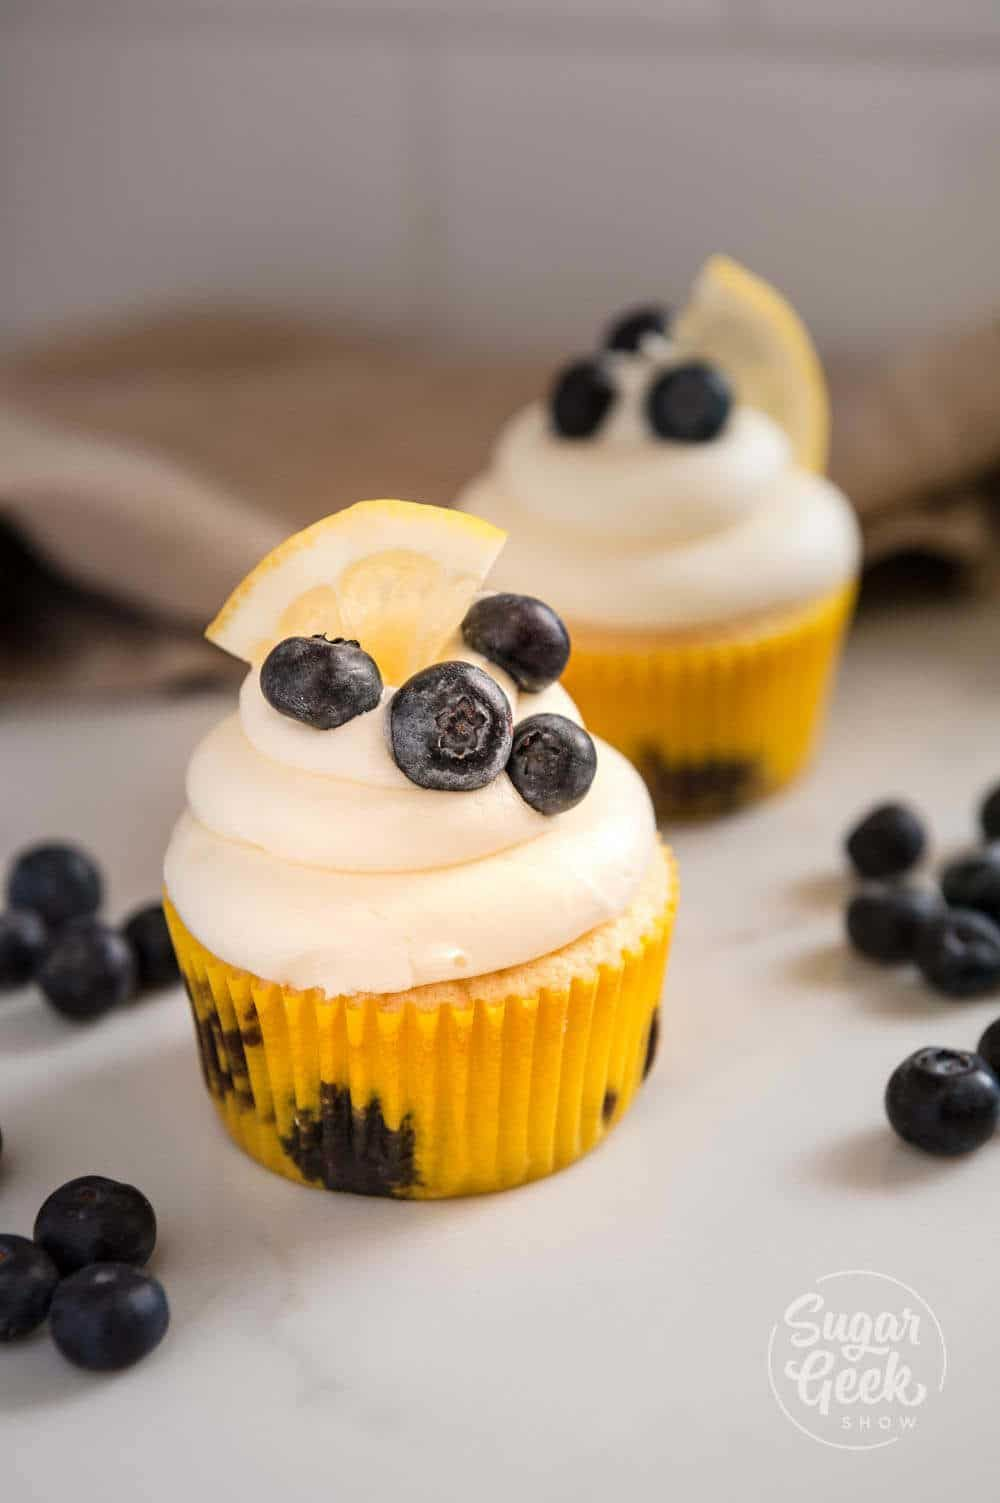 Lemon Blueberry Buttermilk Cake Lemon Cream Cheese Frosting Sugar Geek Show Recipe In 2020 Blueberry Cake Recipes Blueberry Lemon Cake Delicious Lemon Cake